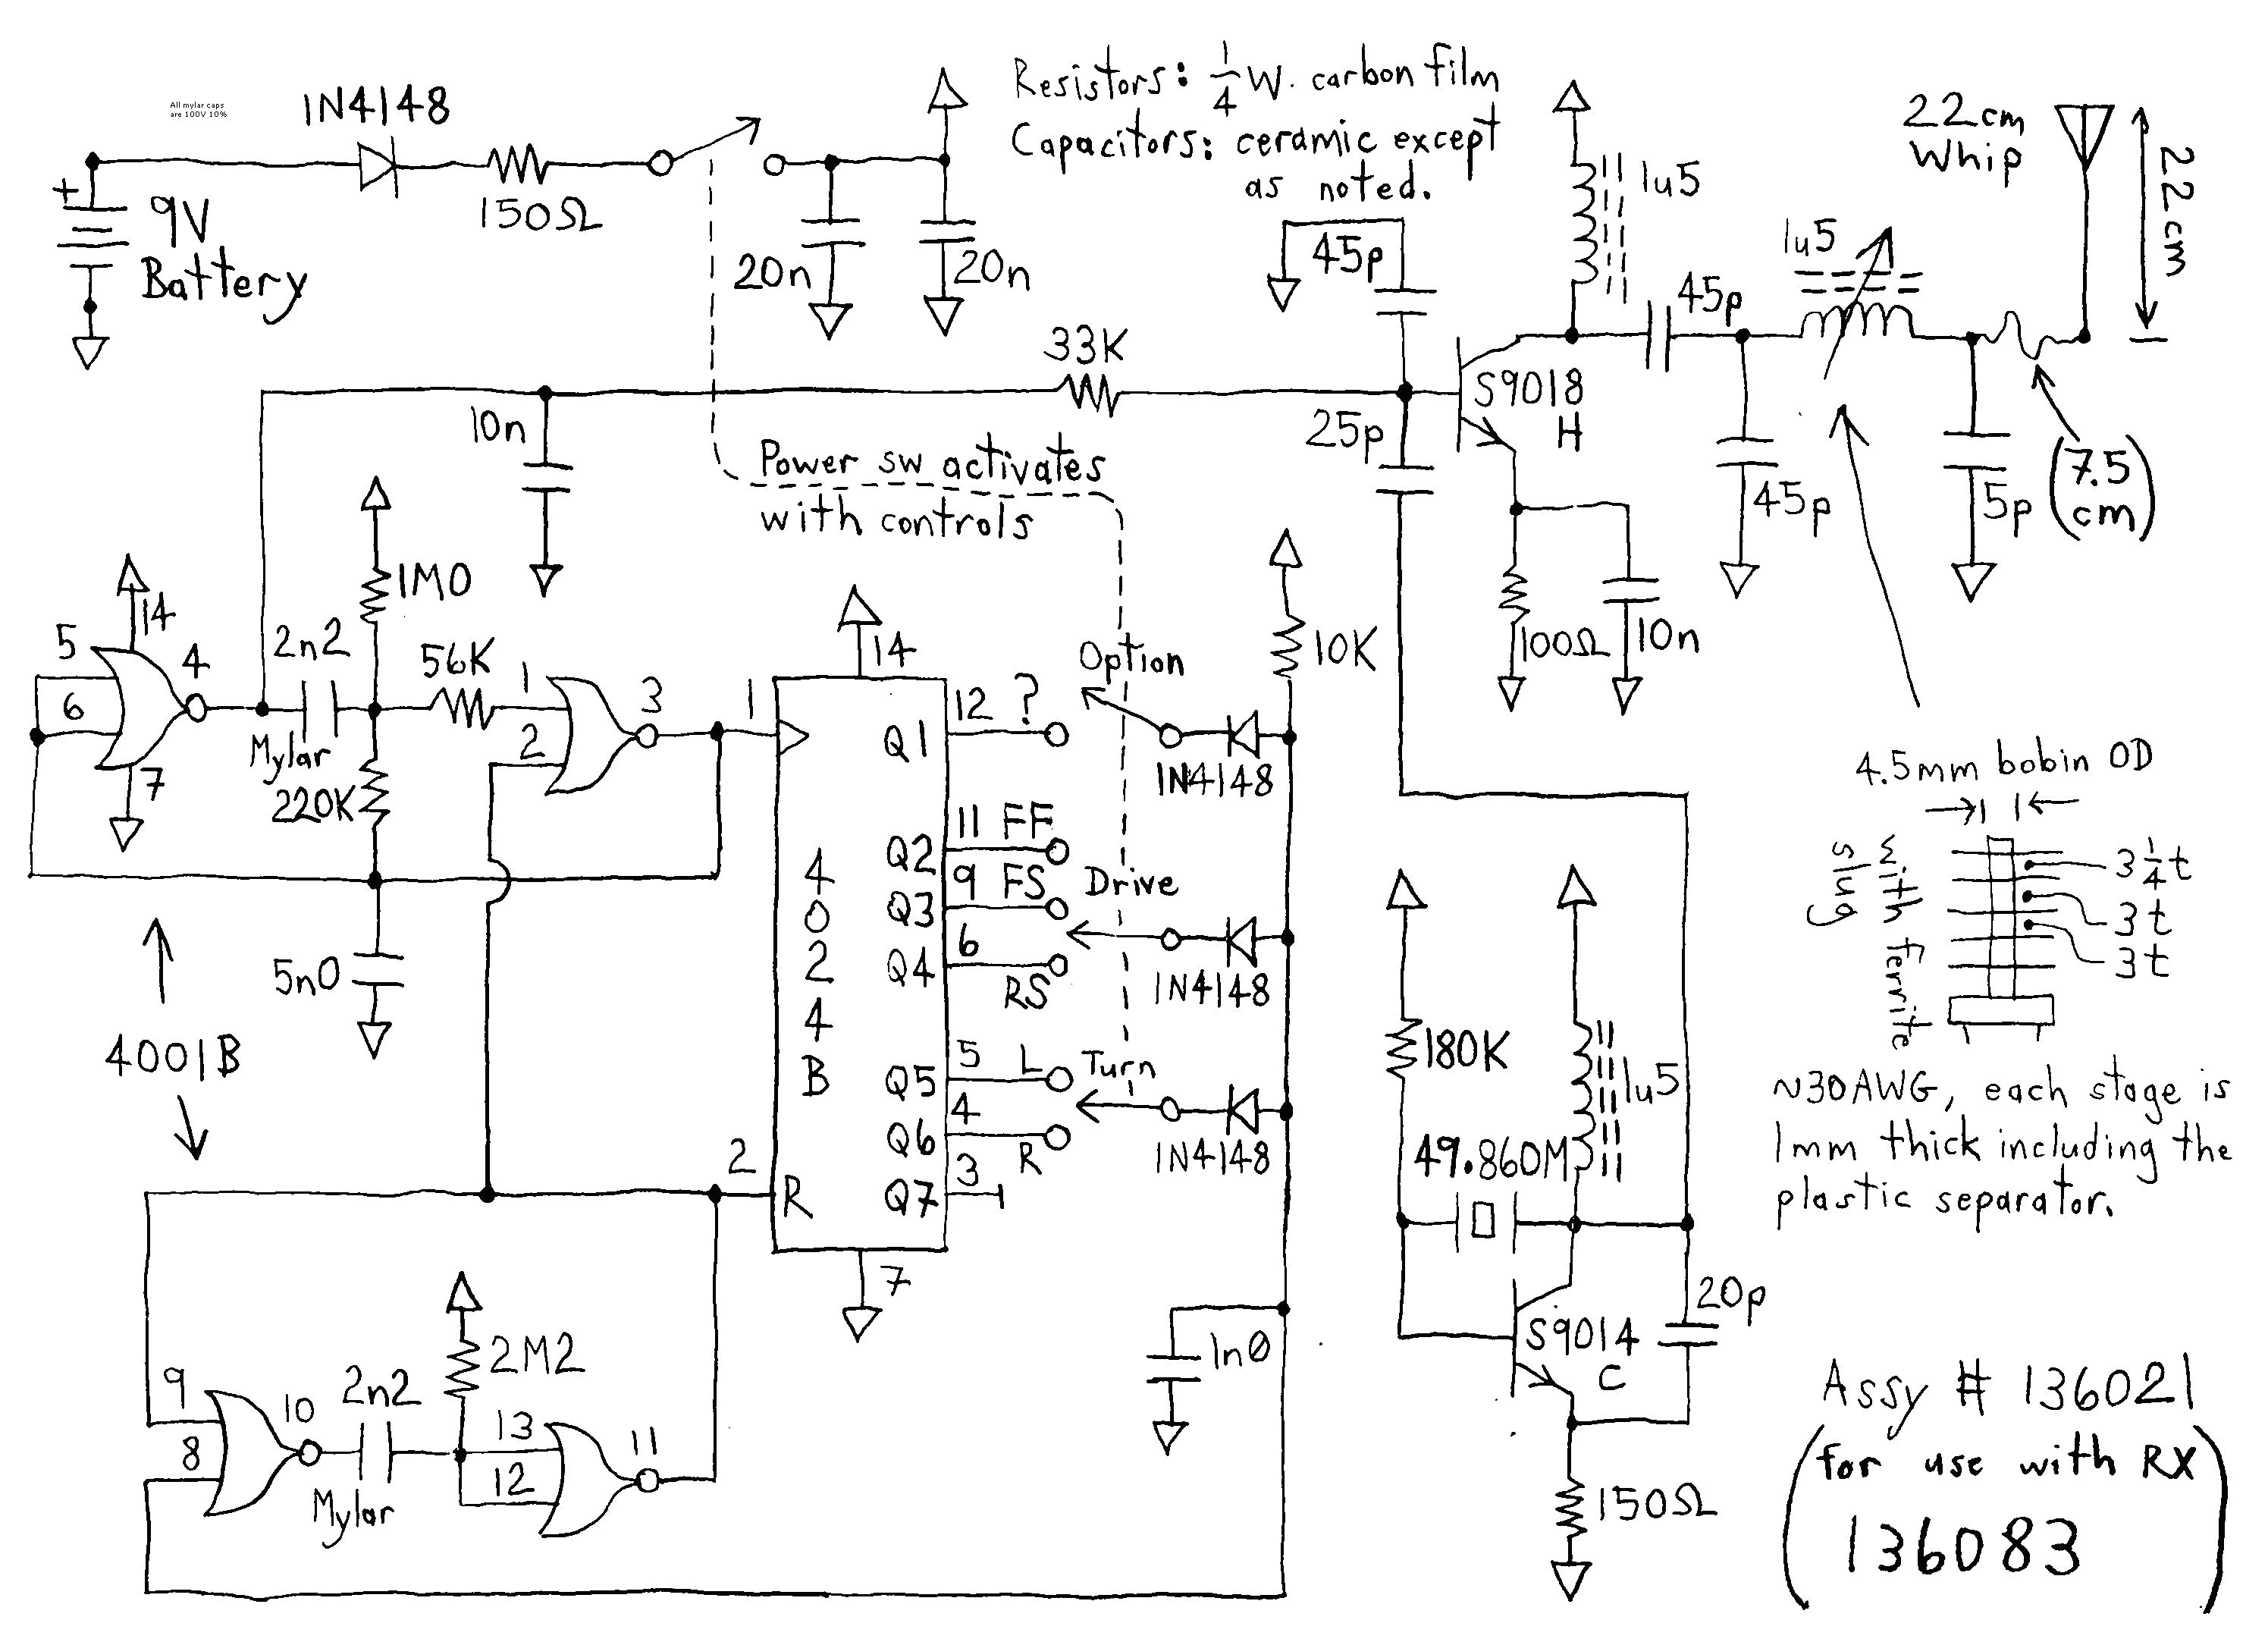 iec motor wiring diagram wiring diagram list iec motor wiring diagram